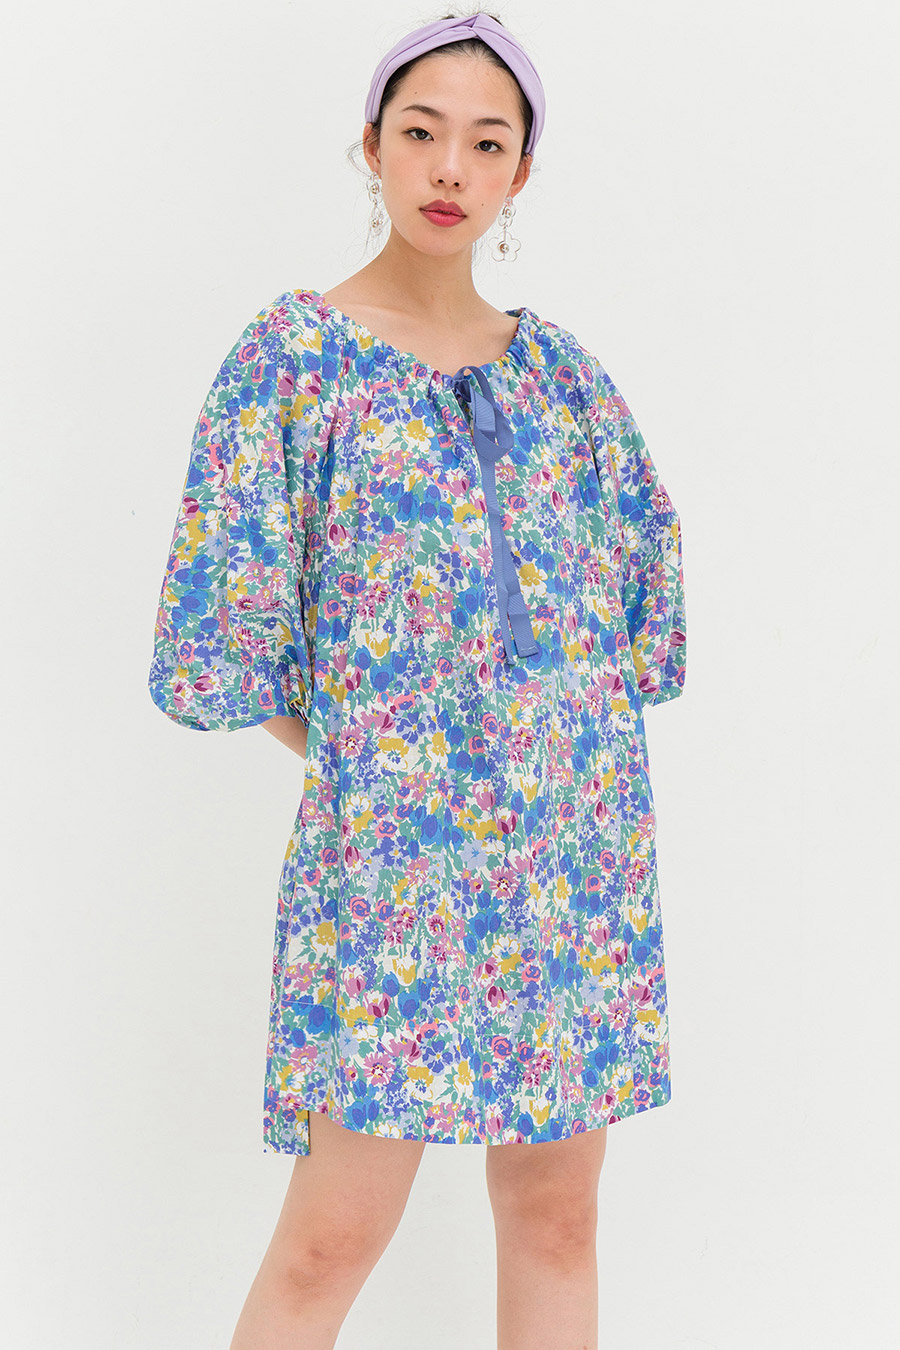 MARLENE DRESS - LAGOON FLEUR